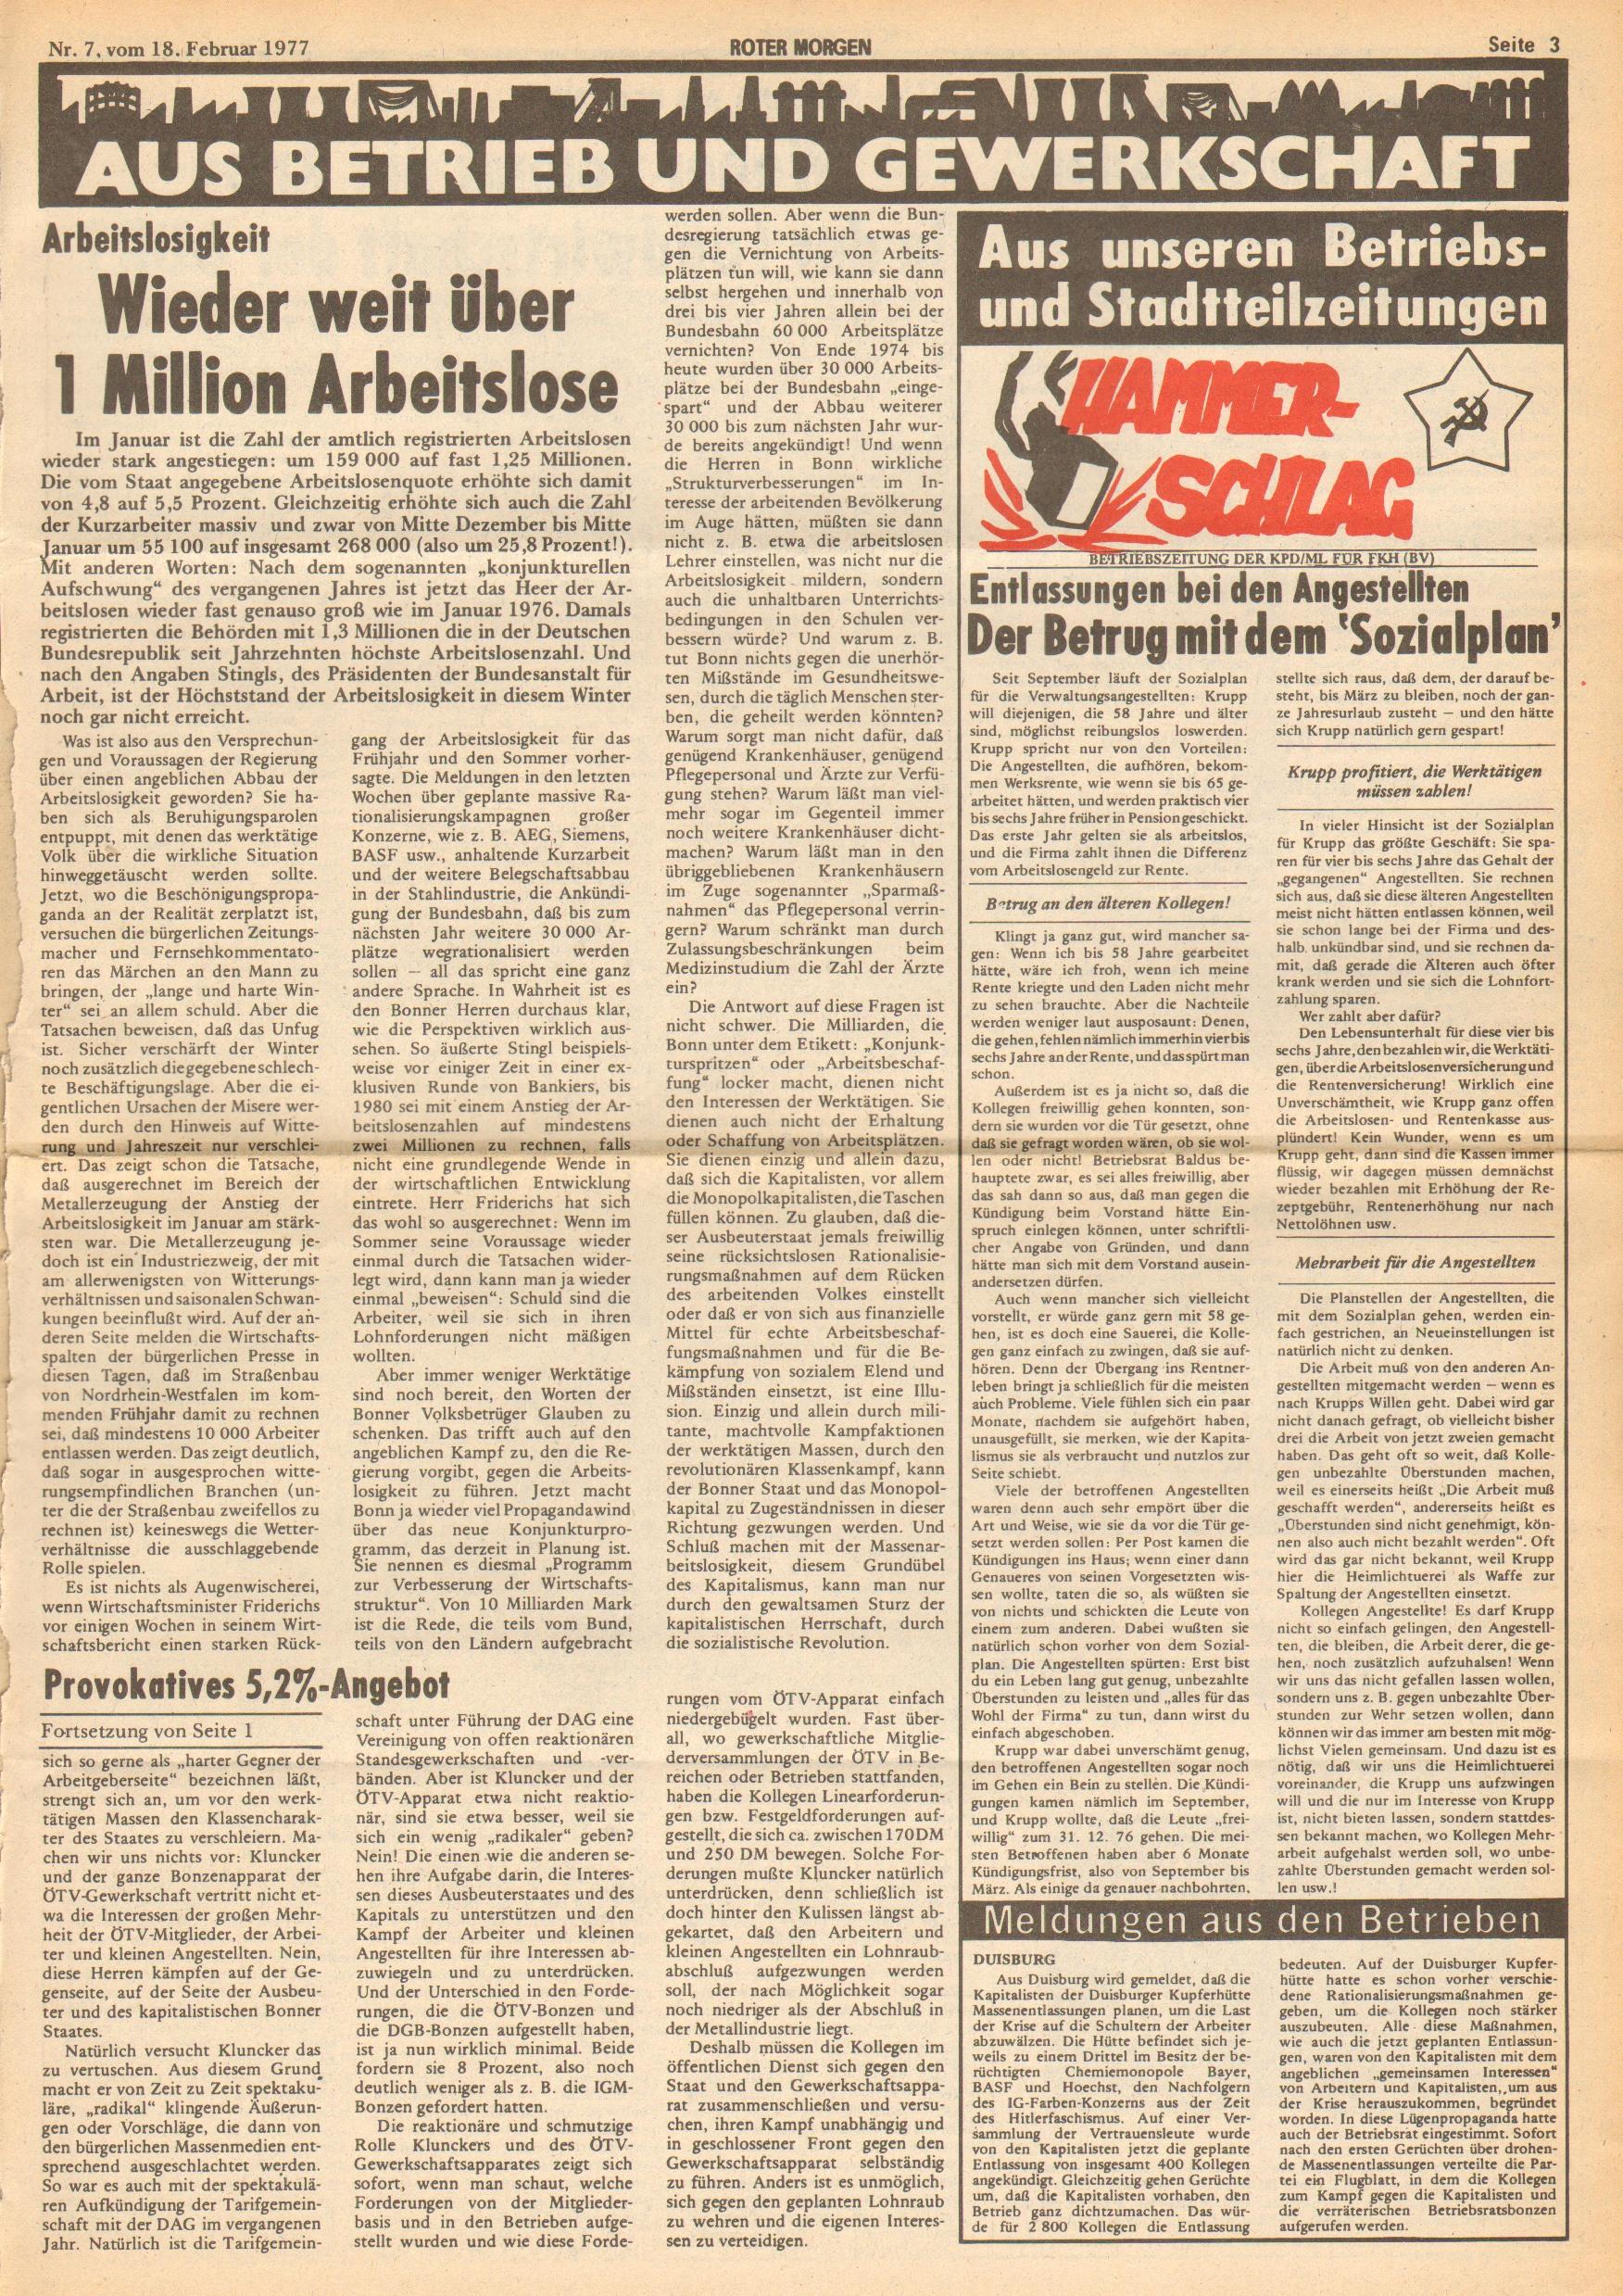 Roter Morgen, 11. Jg., 18. Februar 1977, Nr. 7, Seite 3